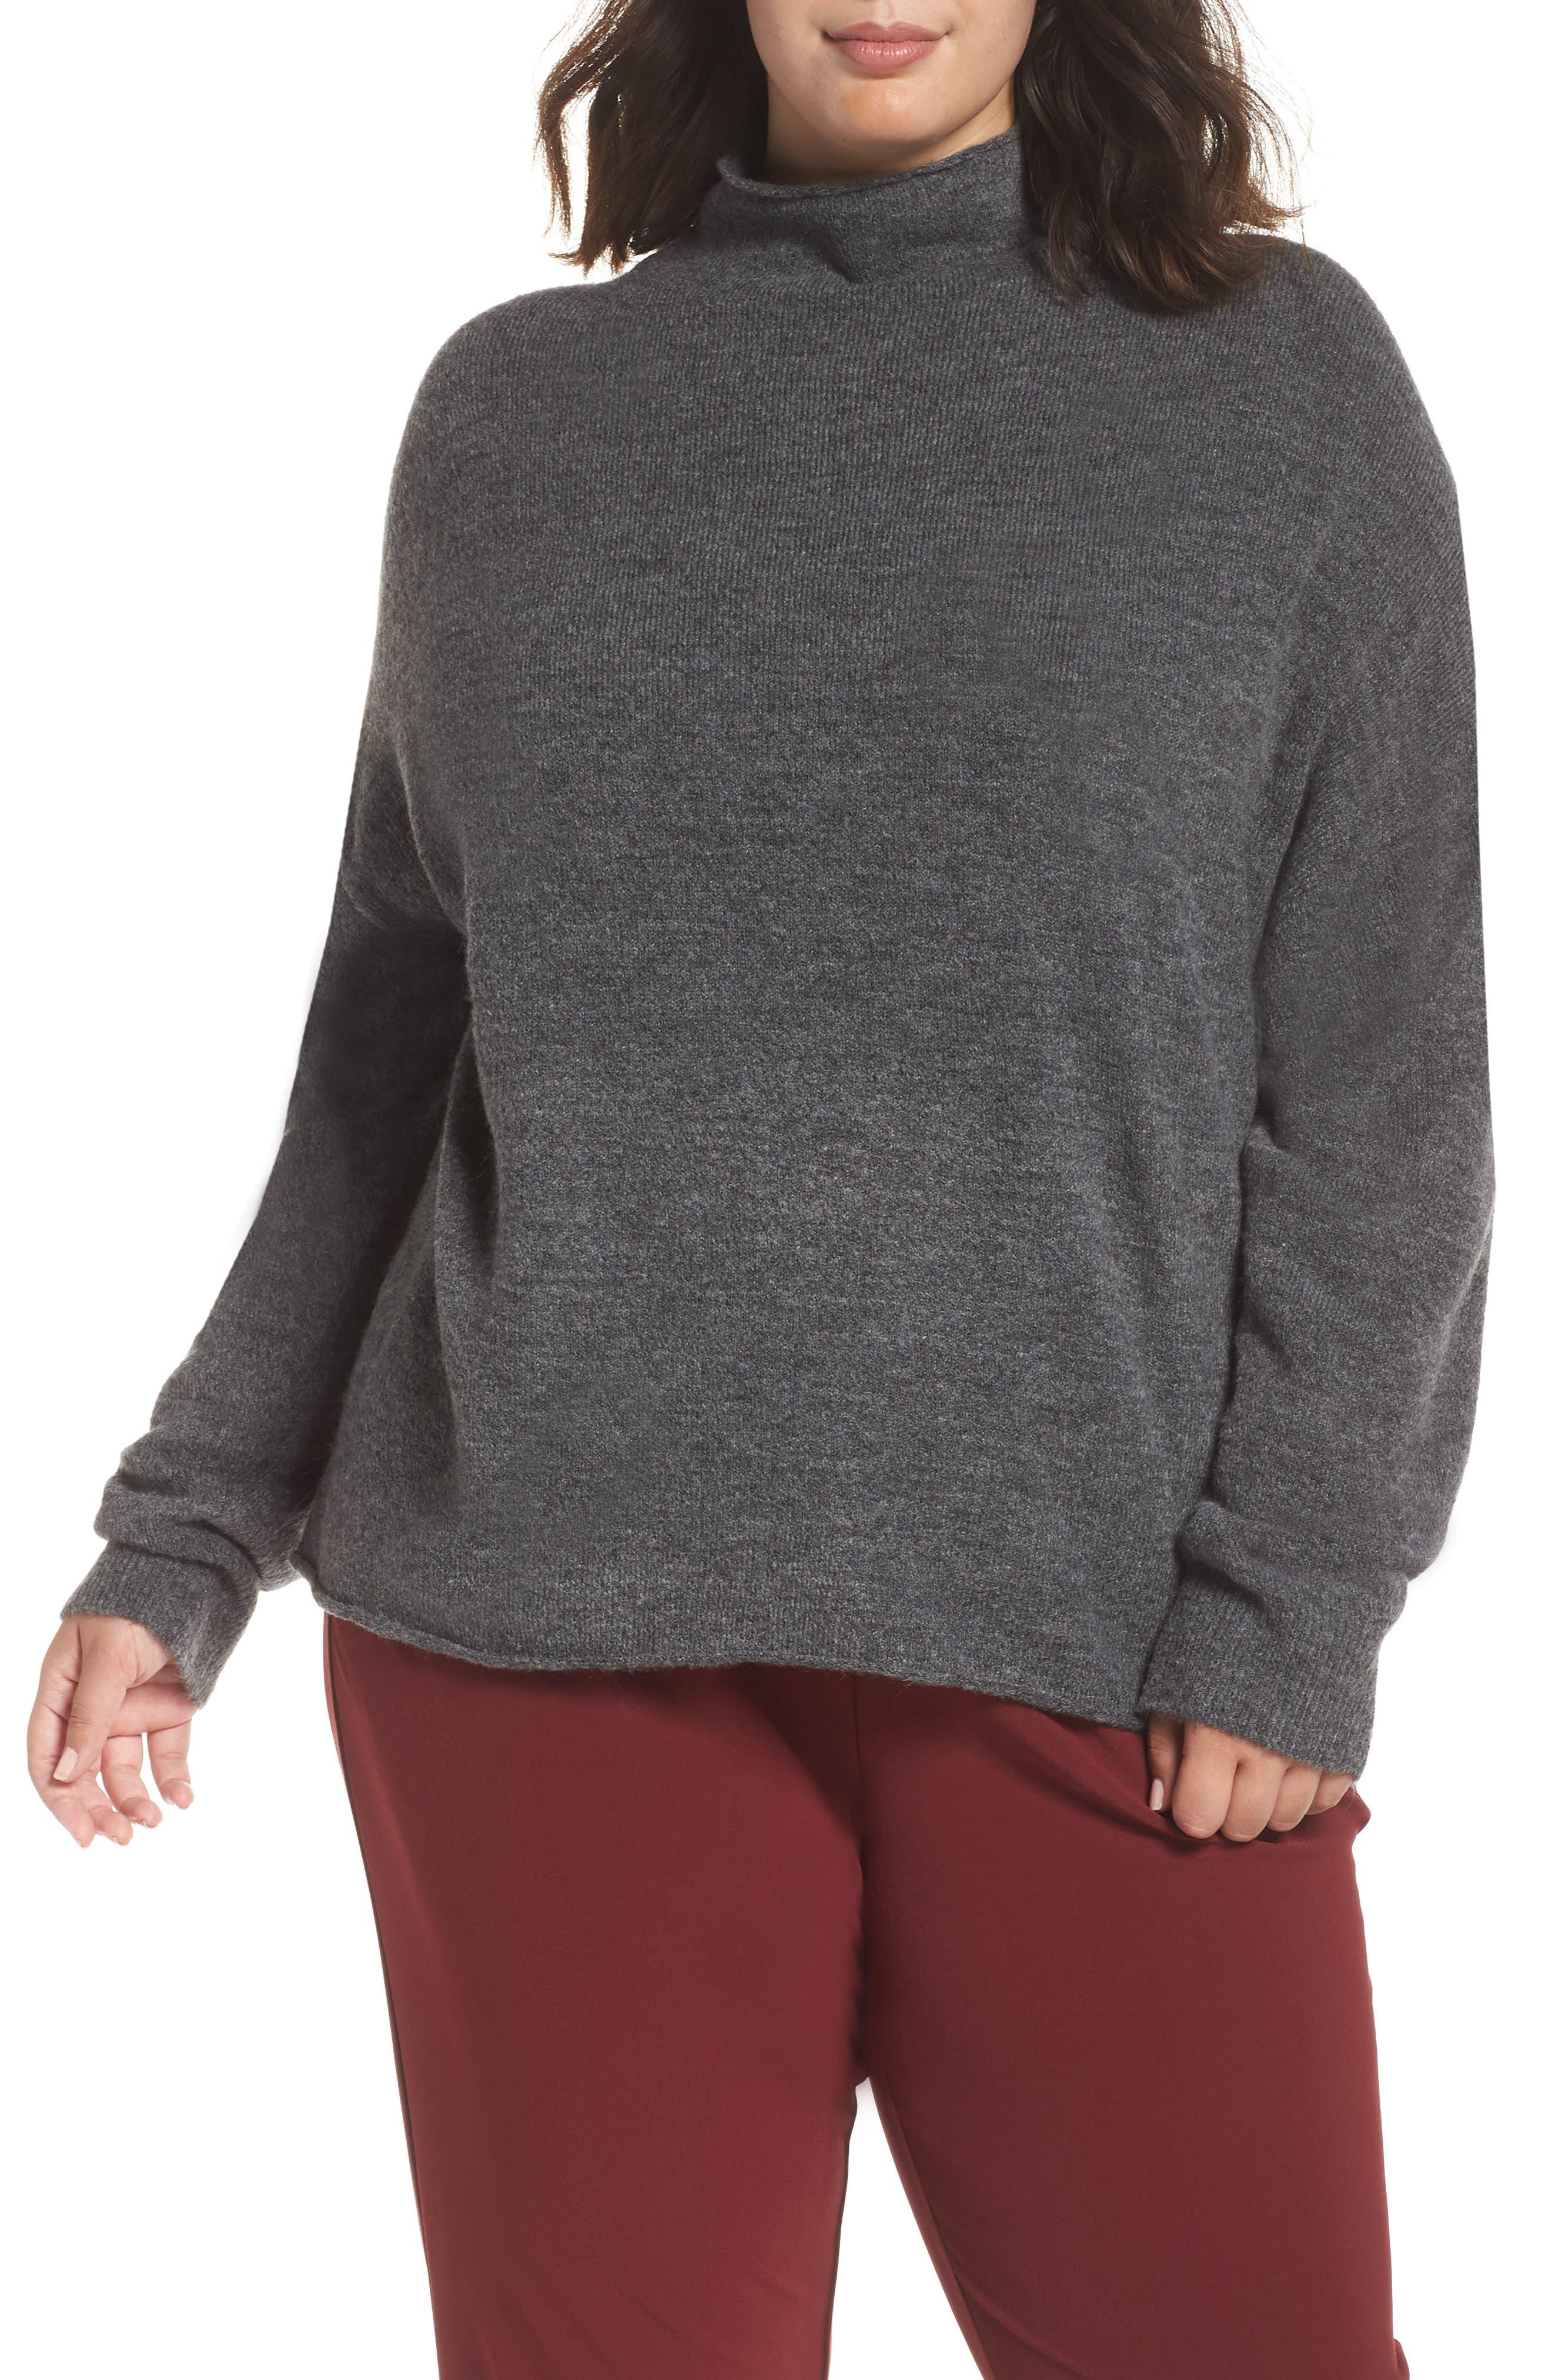 Cozy Mock Neck Sweater,                             Alternate thumbnail 2, color,                             GREY MEDIUM CHARCOAL HEATHER